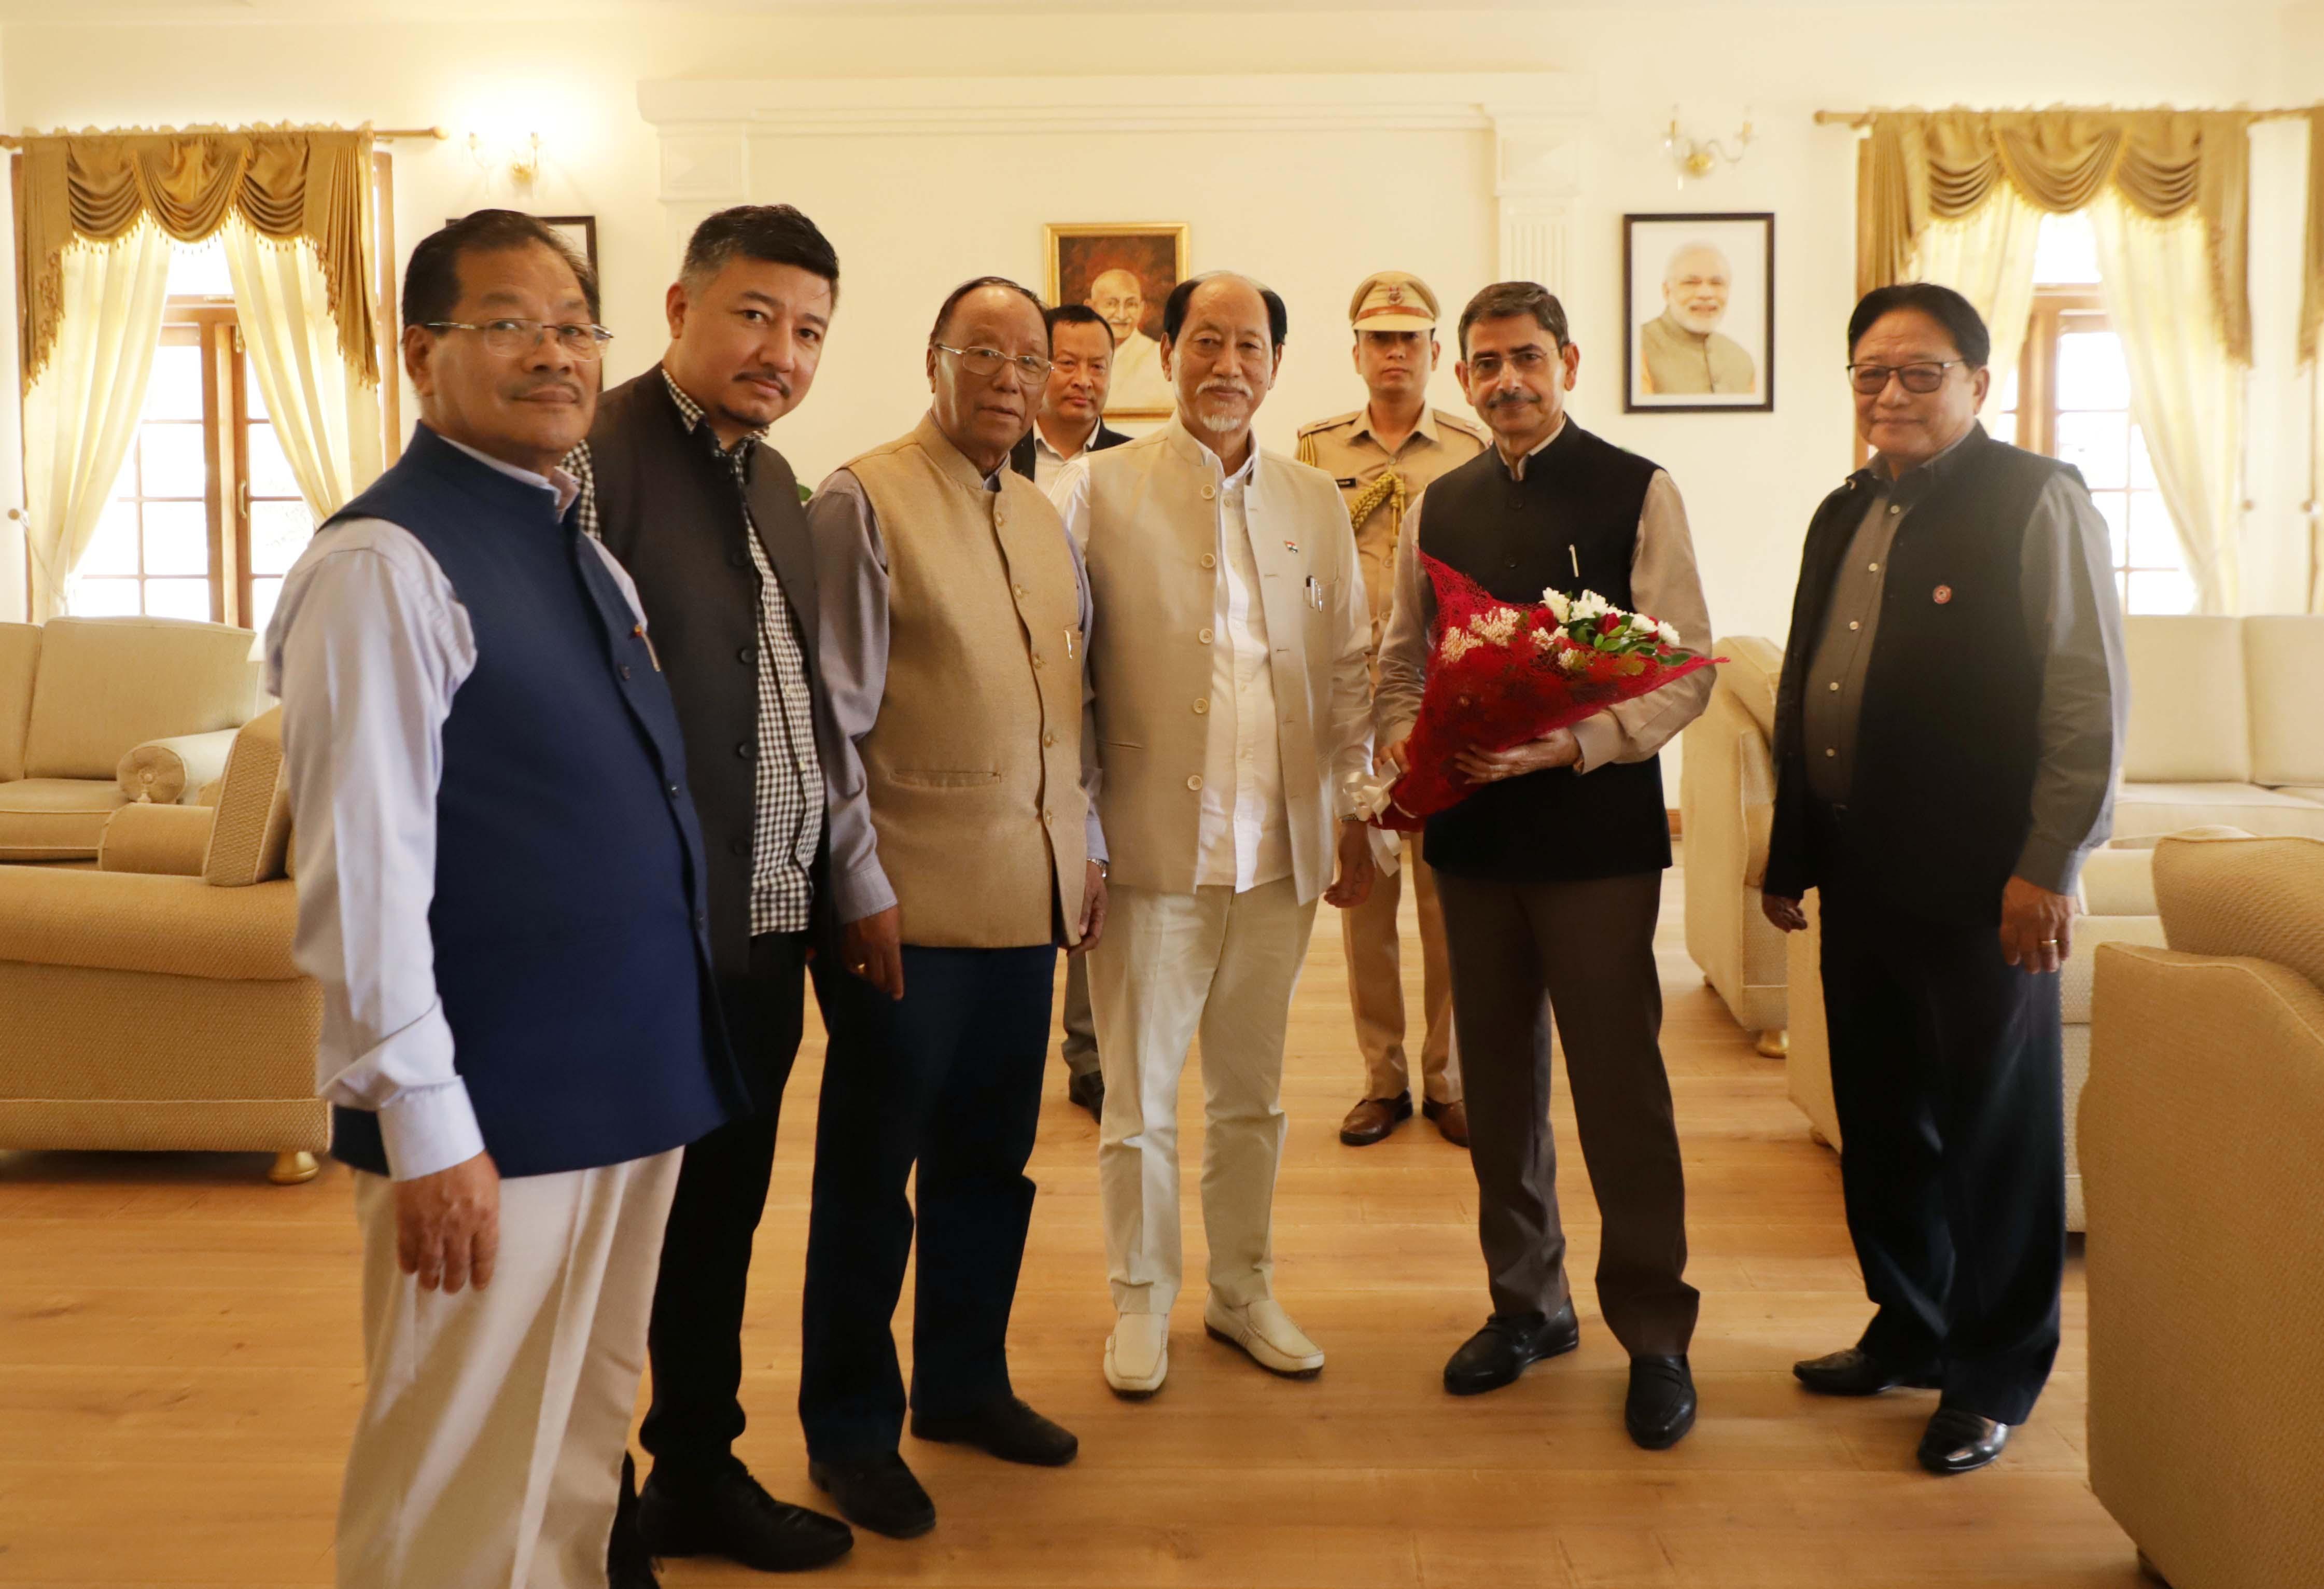 NDPP reiterates stand on Indo-Naga political dialogue